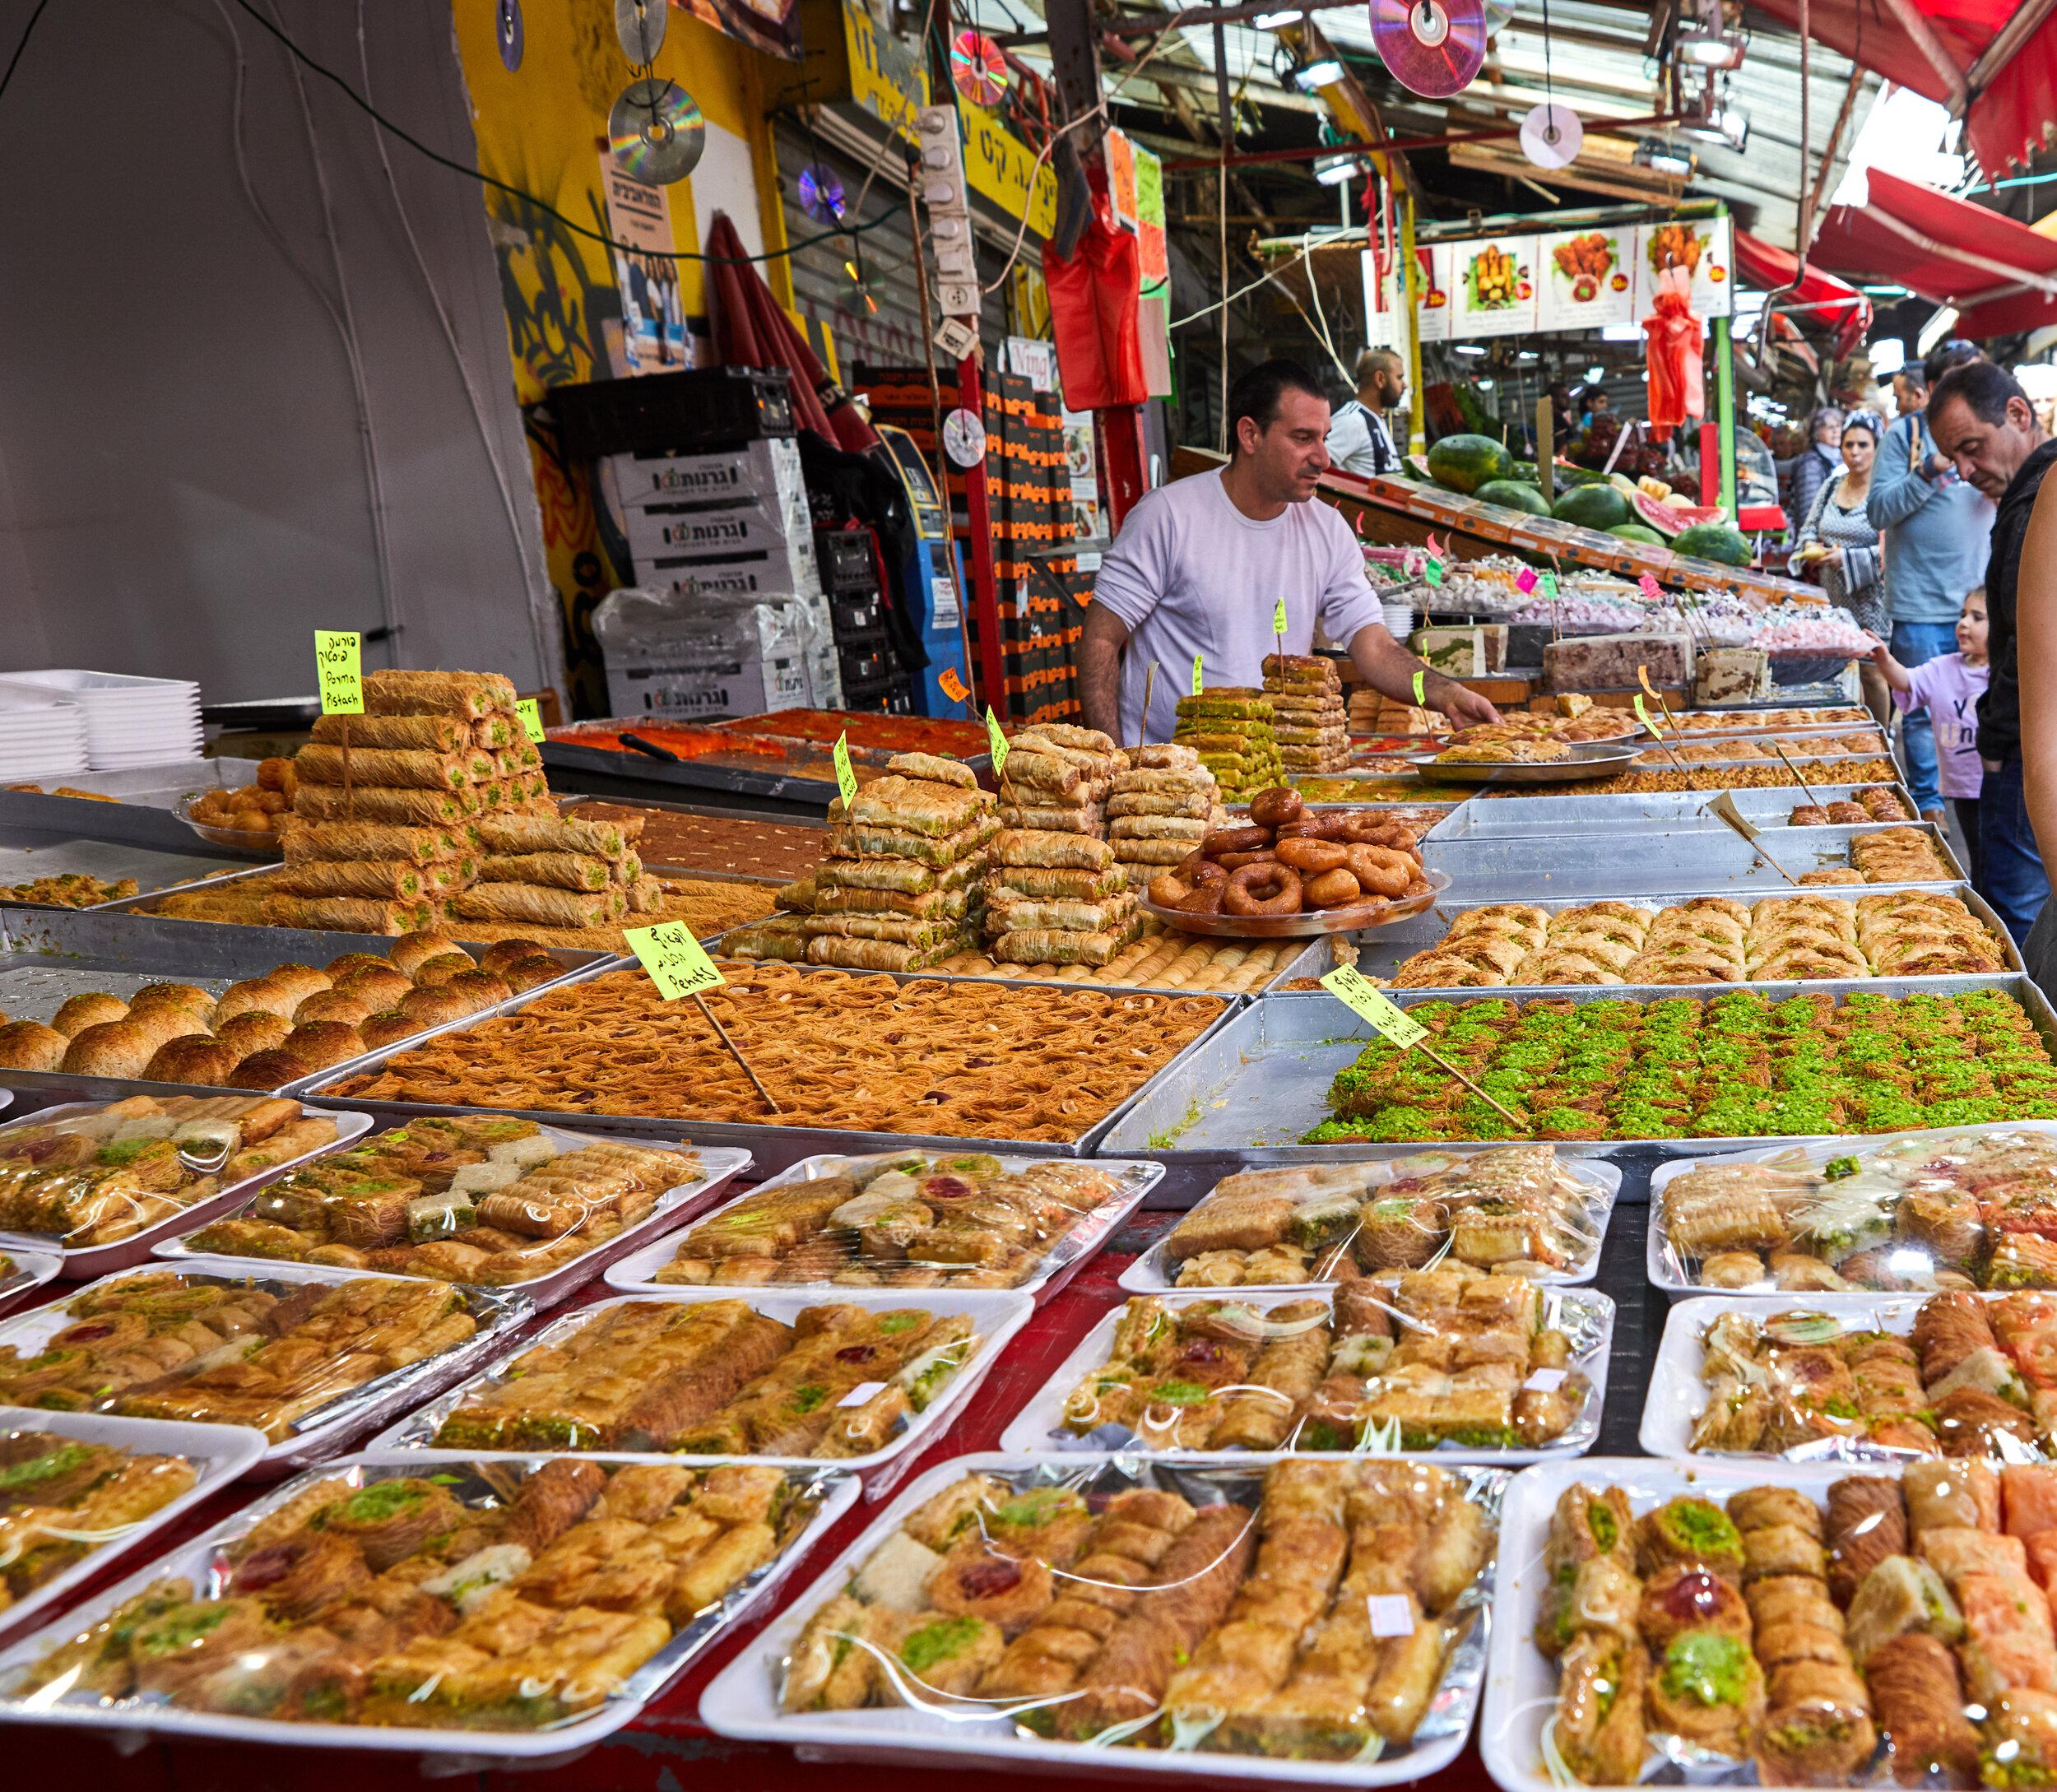 Israeli street food at the open market in Tel Aviv.